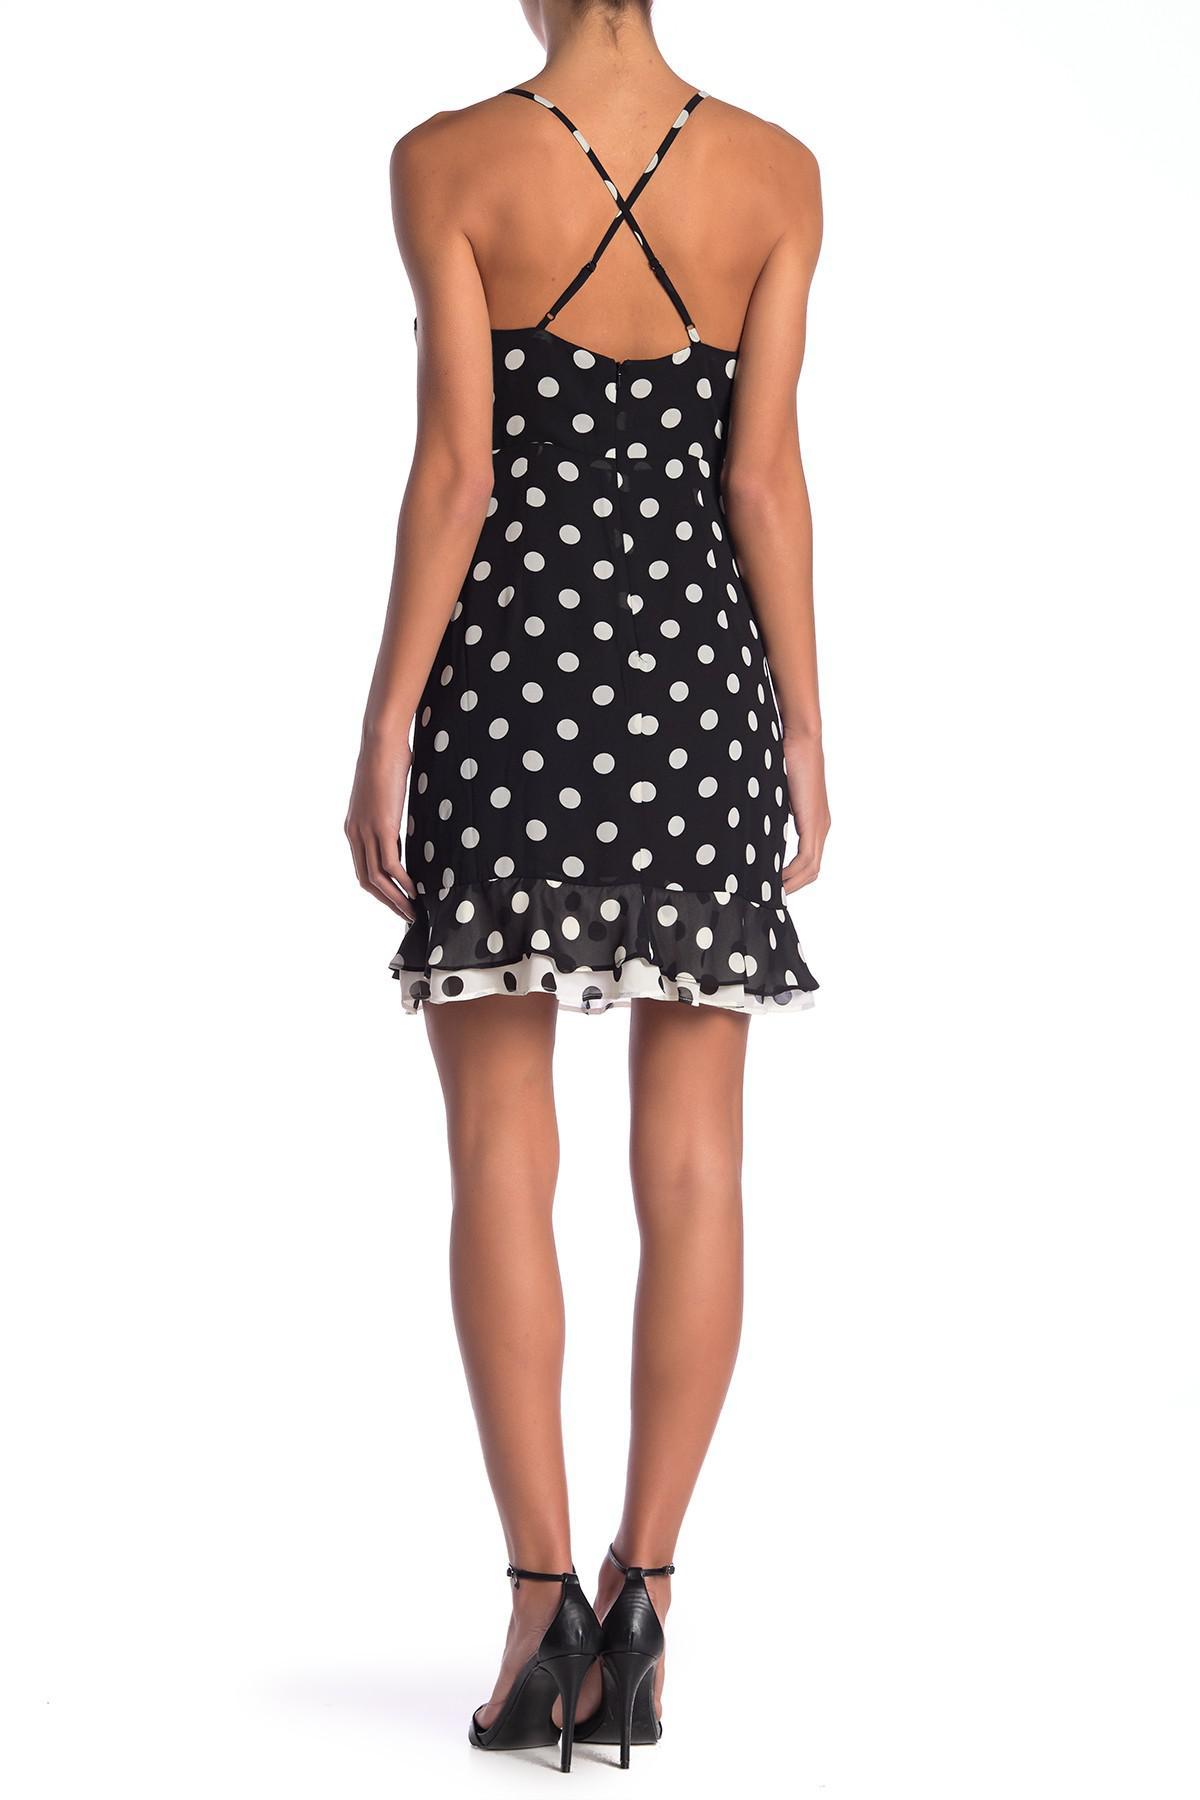 8ef5a15abe68 Bardot - Black Kinsley Printed Wrap Dress - Lyst. View fullscreen